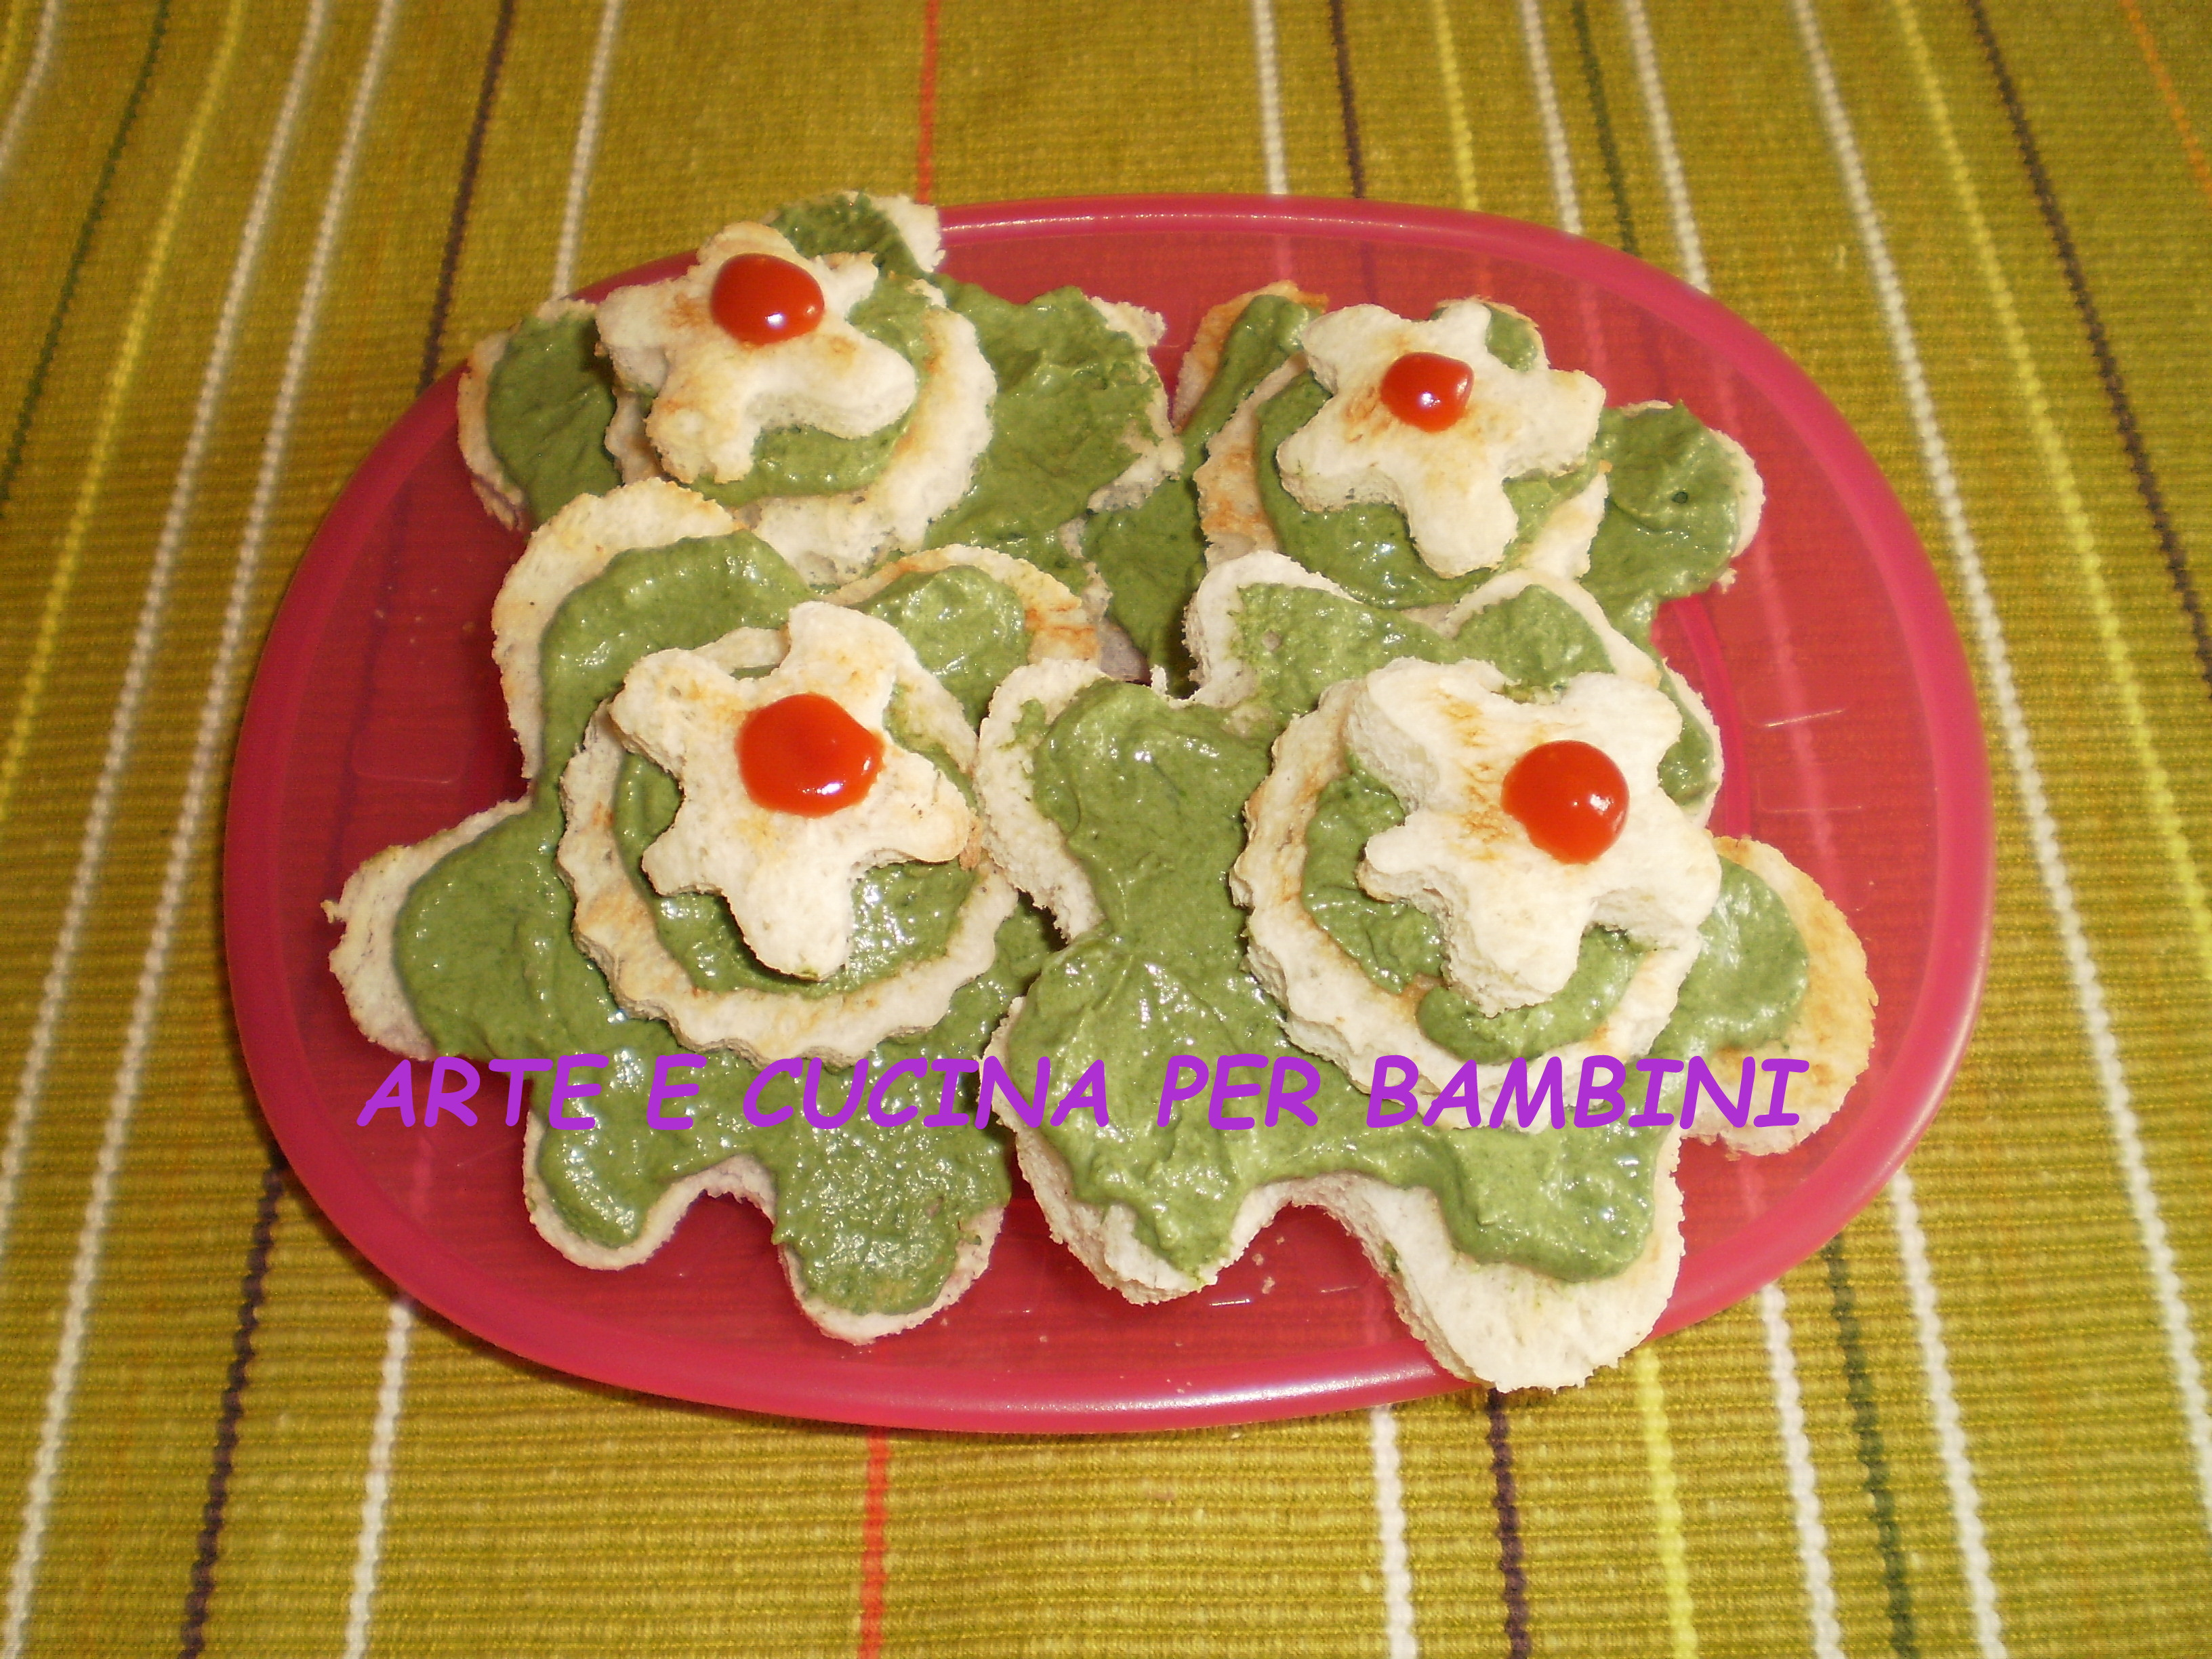 Zucchine in fiore arte e cucina per bambini for Cucina per bambini